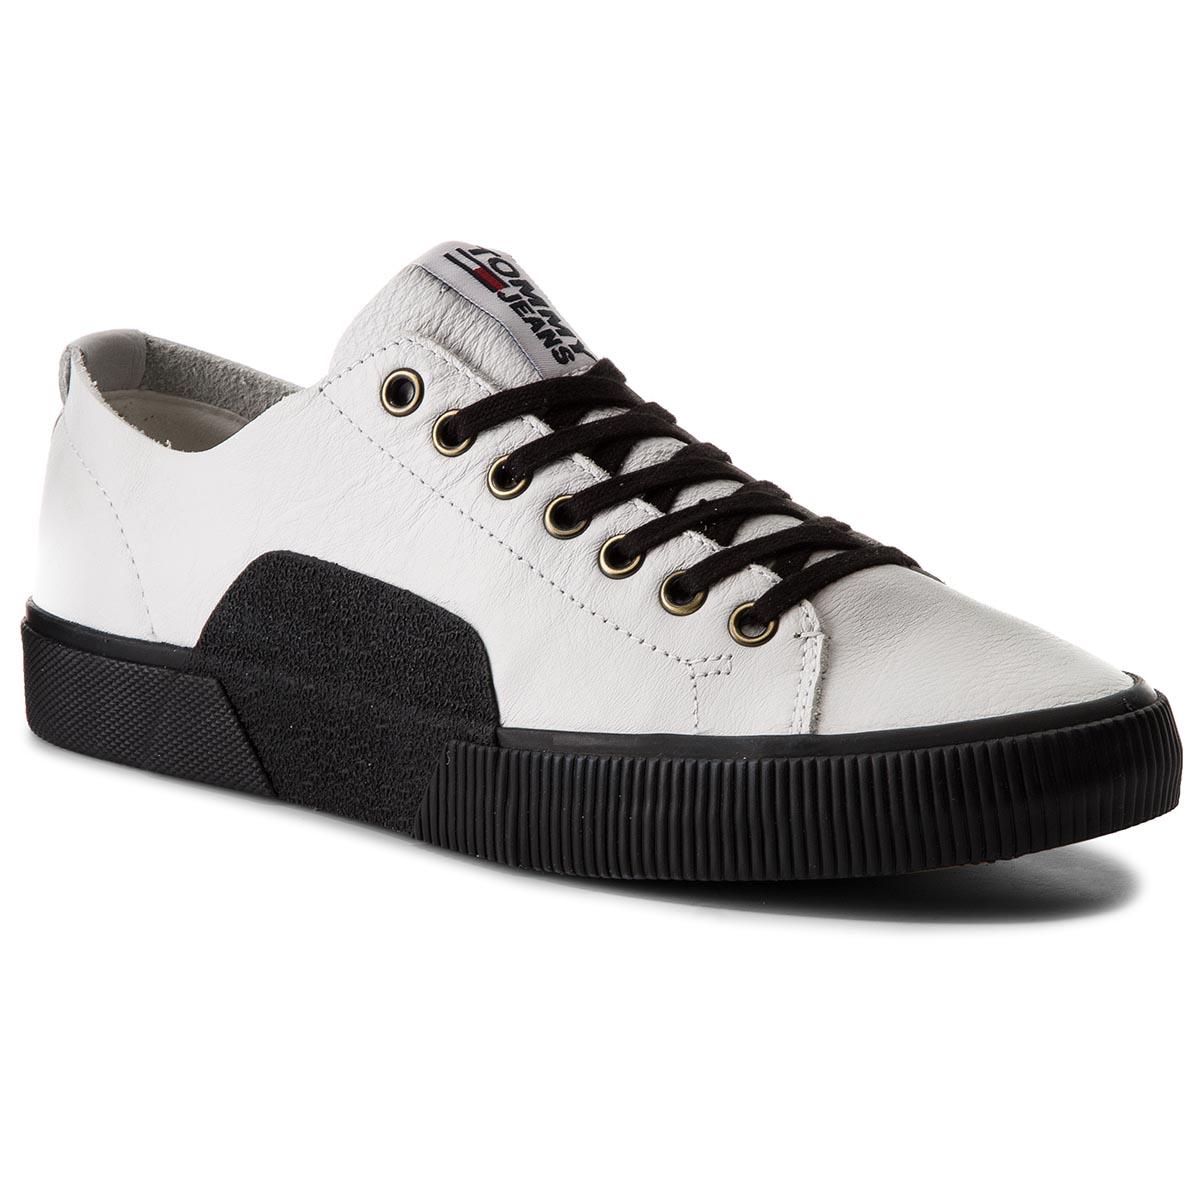 Sportcipő TOMMY JEANS - Tj Urban Leather Sneaker EM0EM00015 White ... 8fbee42cb6